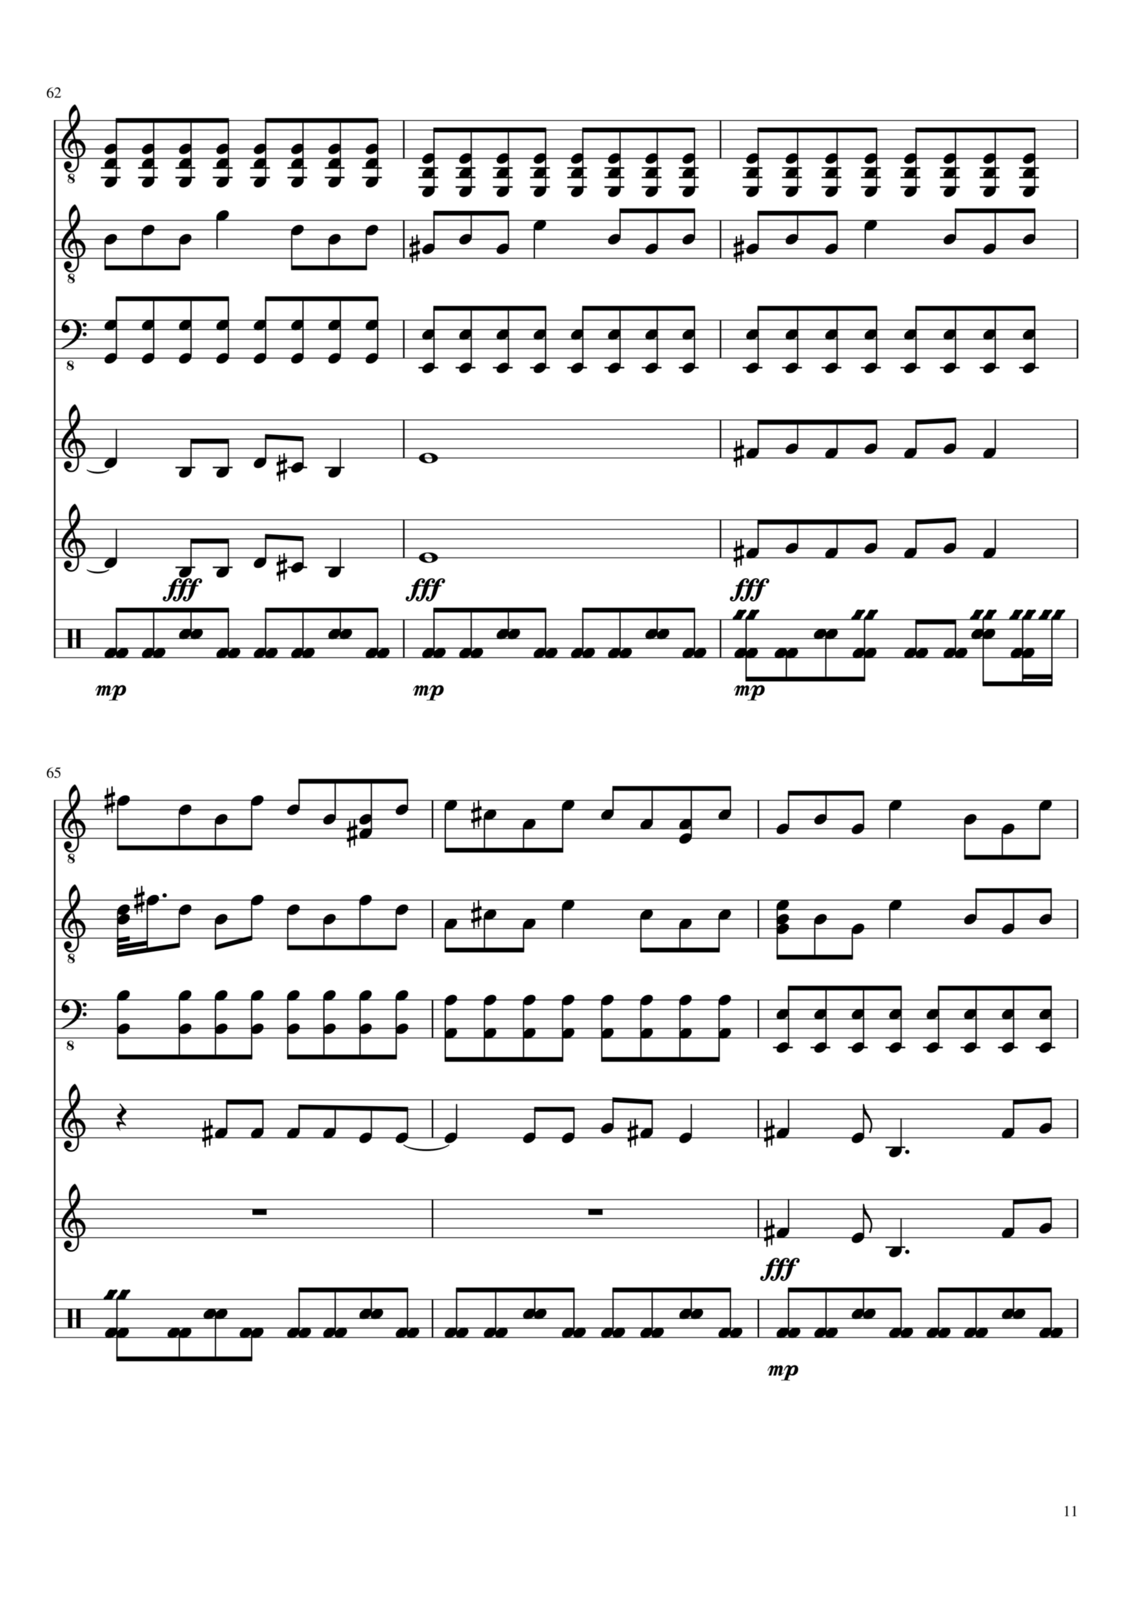 Ot Bolshogo Uma slide, Image 11